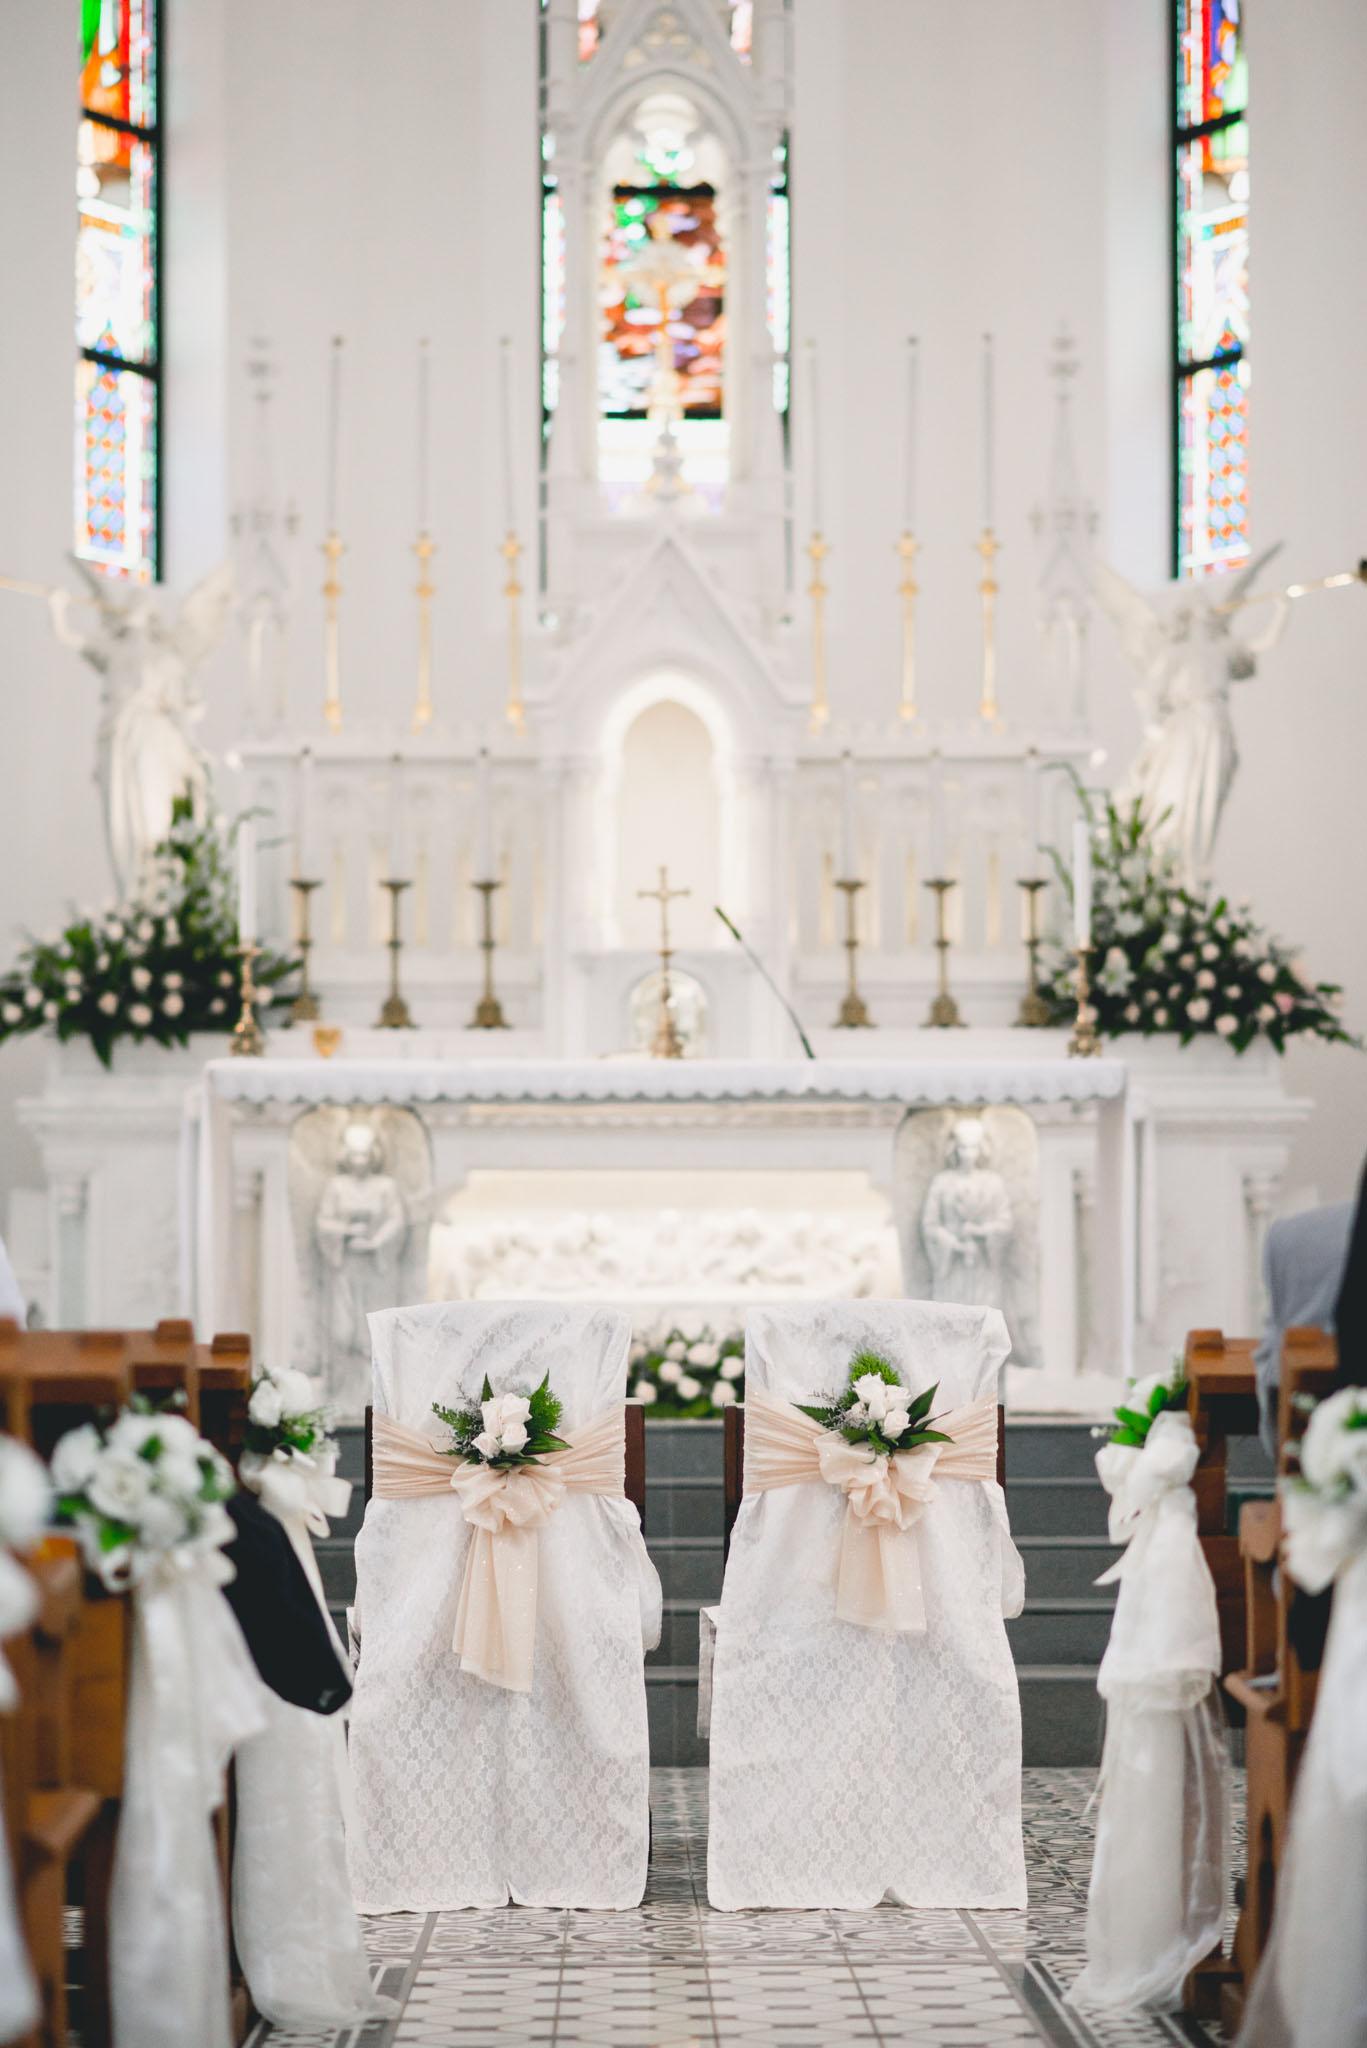 wedding church saints peter and paul 00015b.JPG